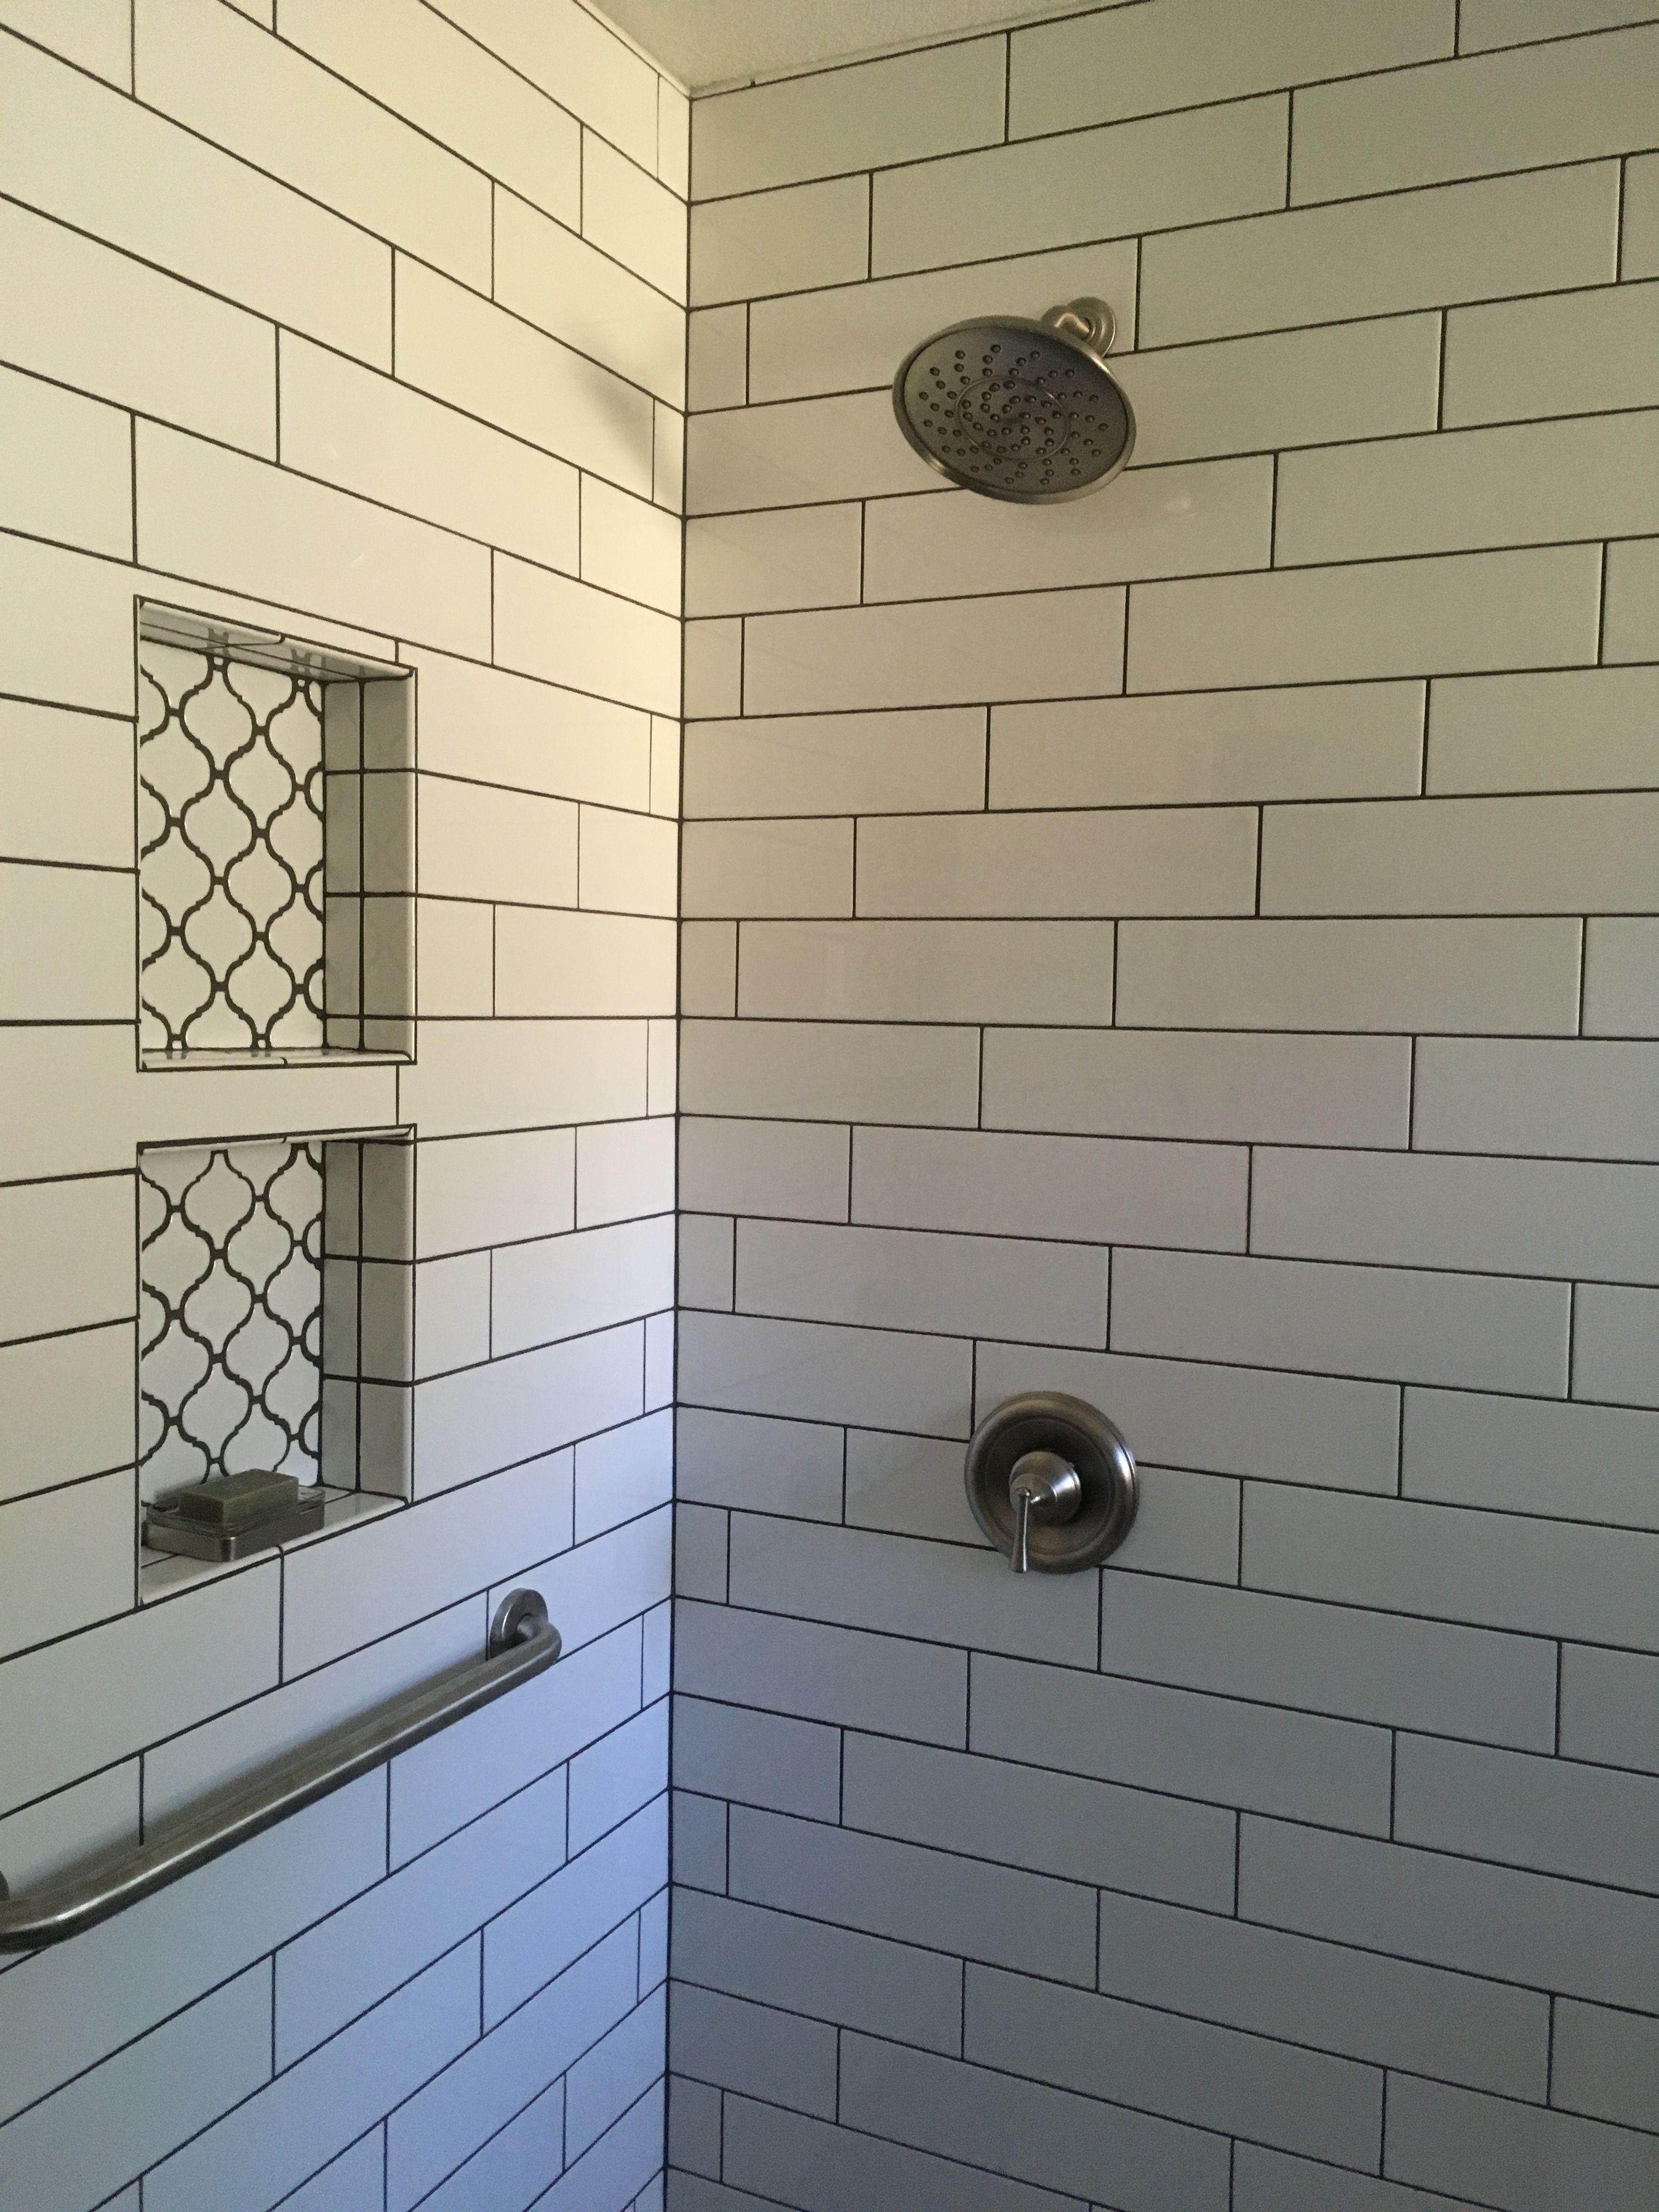 Charcoal Gray Grout 4 X 16 White Subway Tile Moen Showerhead